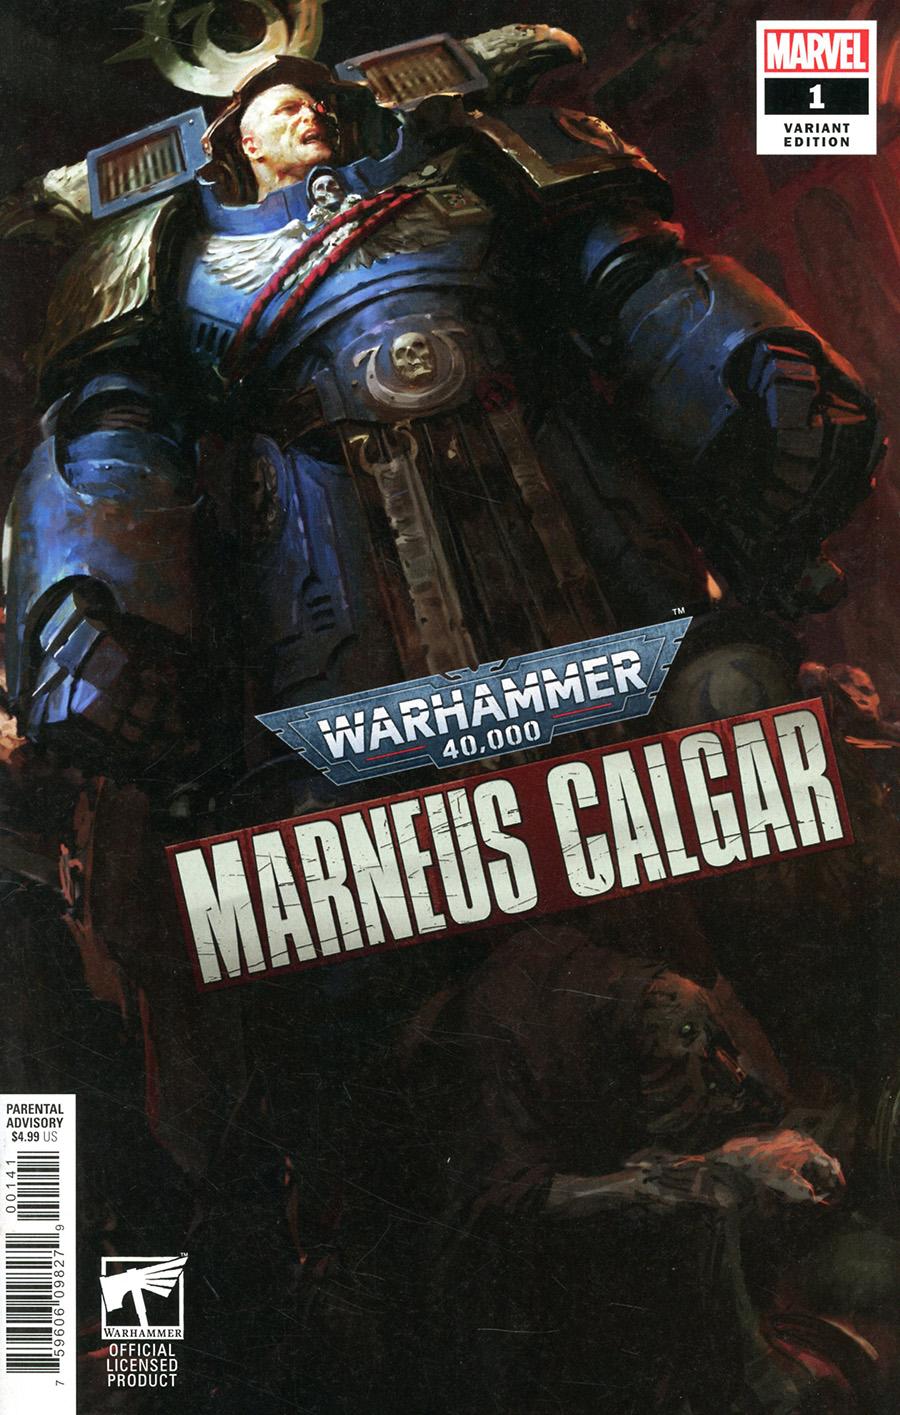 Warhammer 40000 Marneus Calgar #1 Cover B Variant Games Workshop Cover